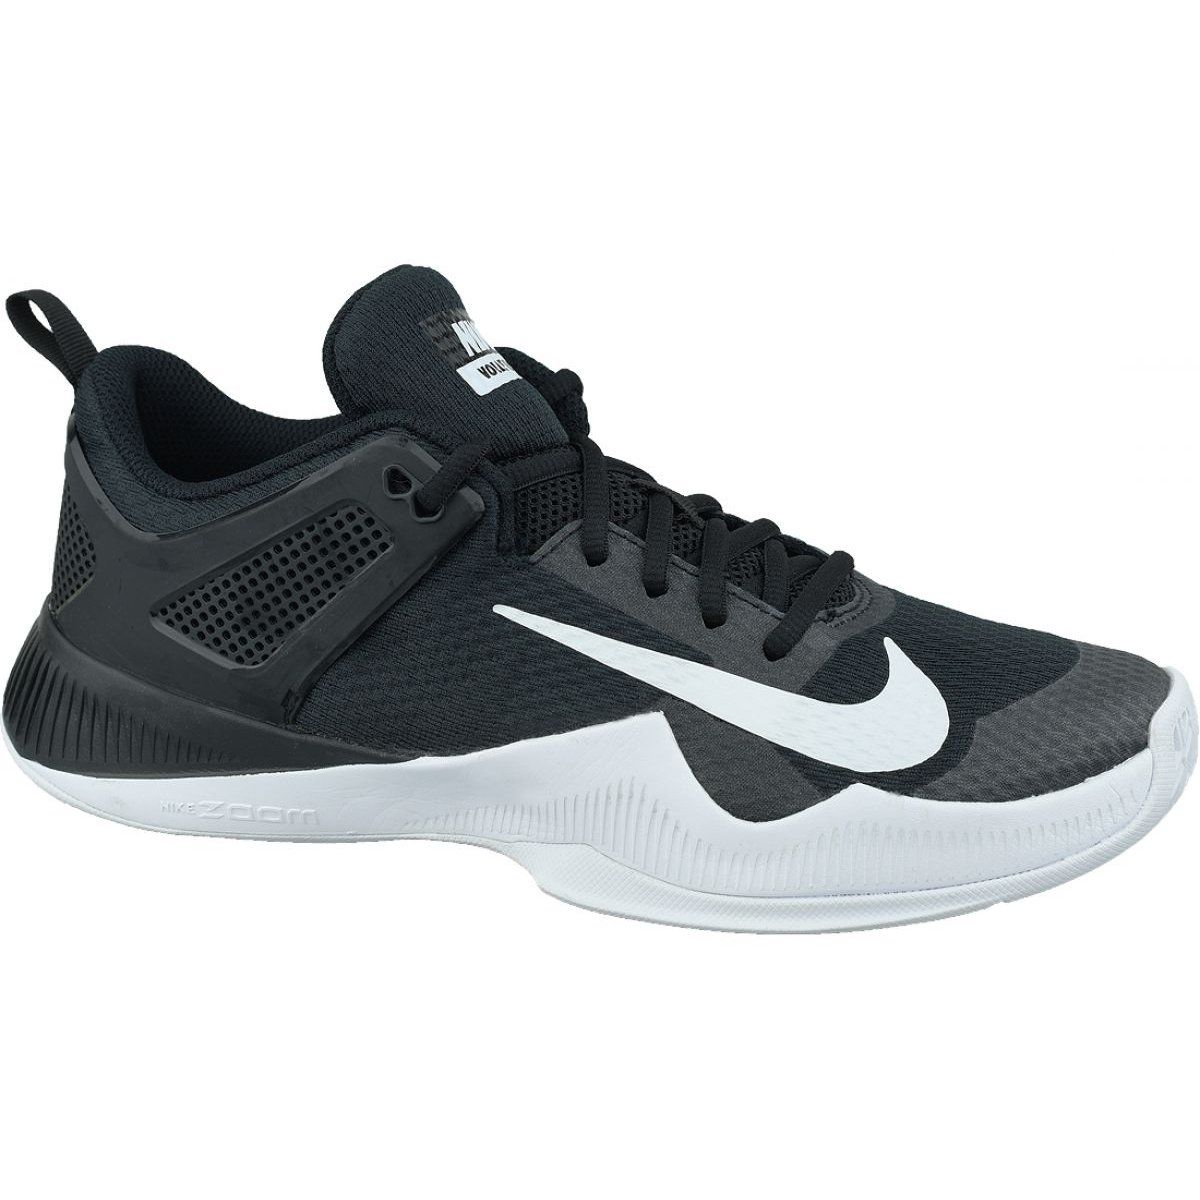 Buty Nike Air Zoom Hyperace M 902367 001 Czarne Nike Volleyball Shoes Nike Volleyball Volleyball Shoes